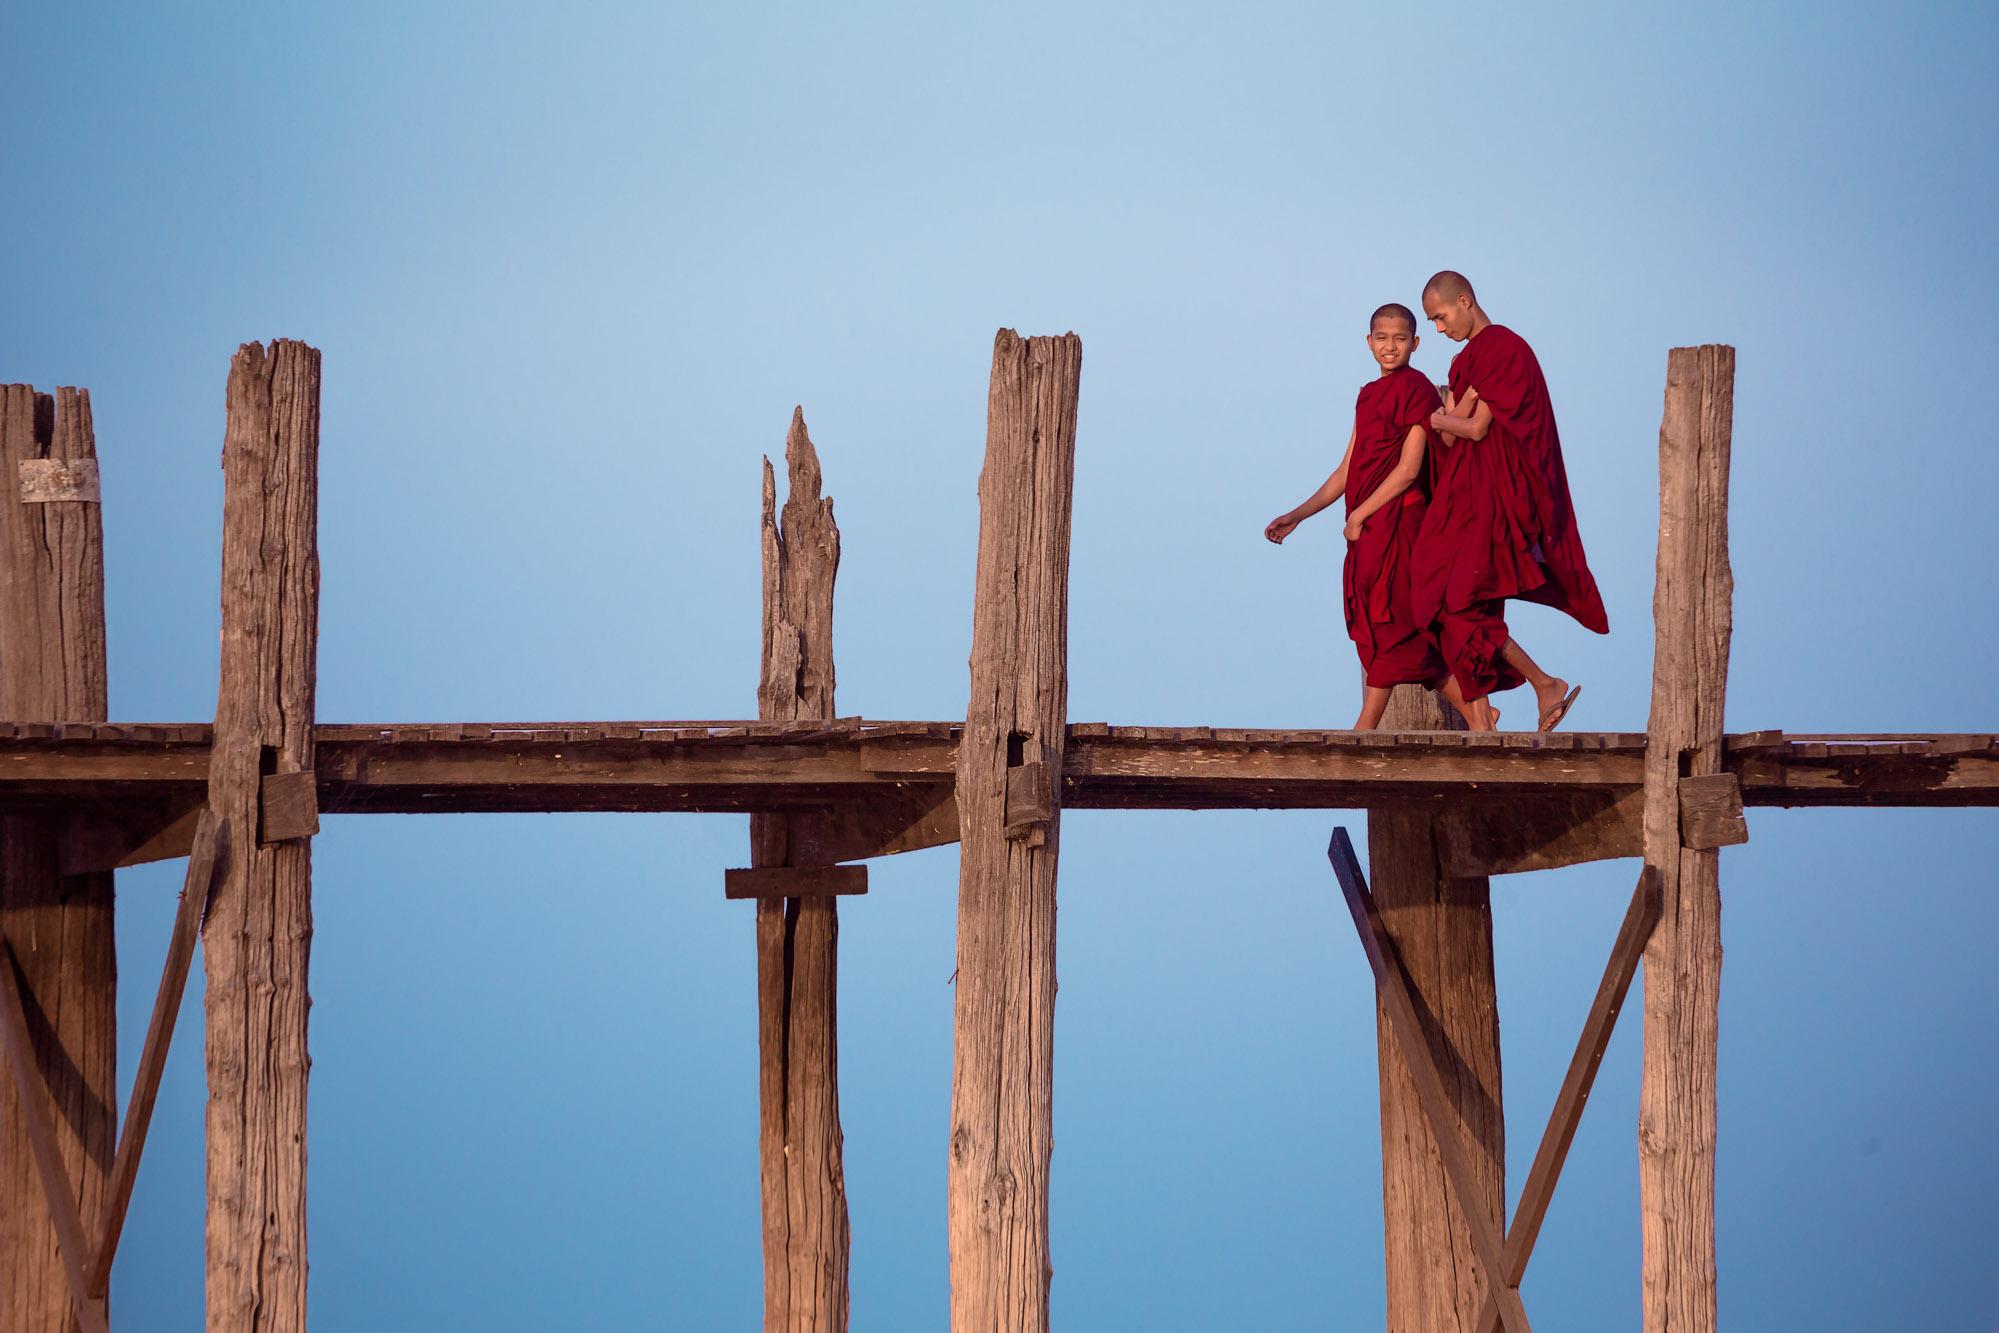 Two Monks on Bridge